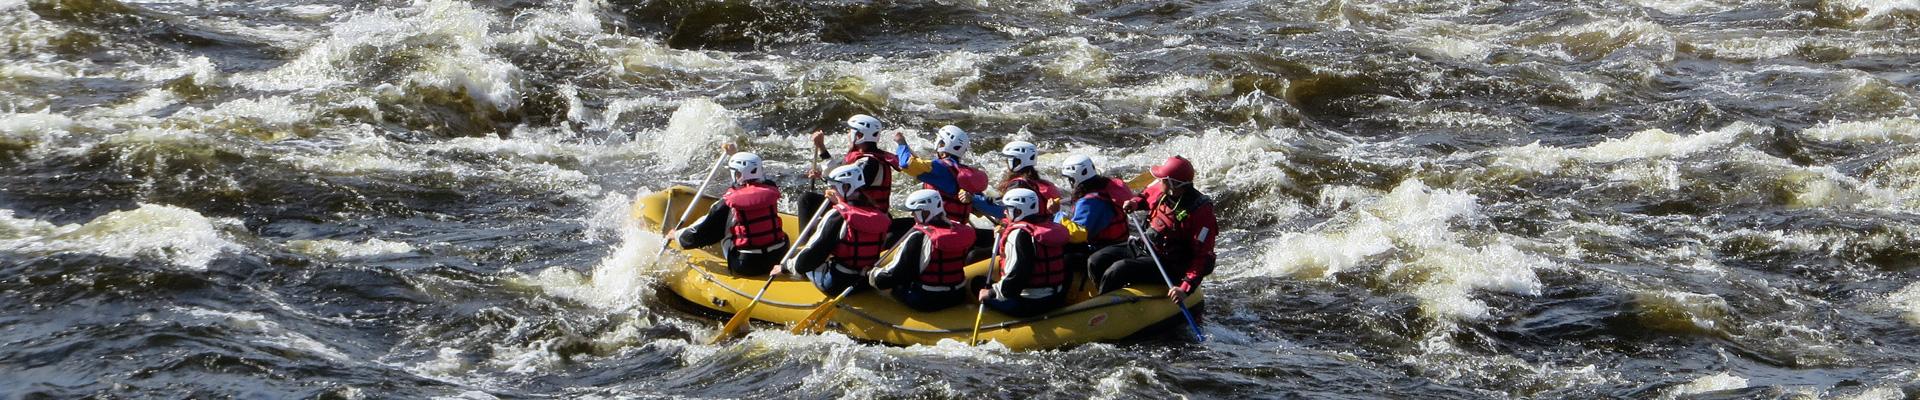 Rafting in Kalix River Swedish Lapland